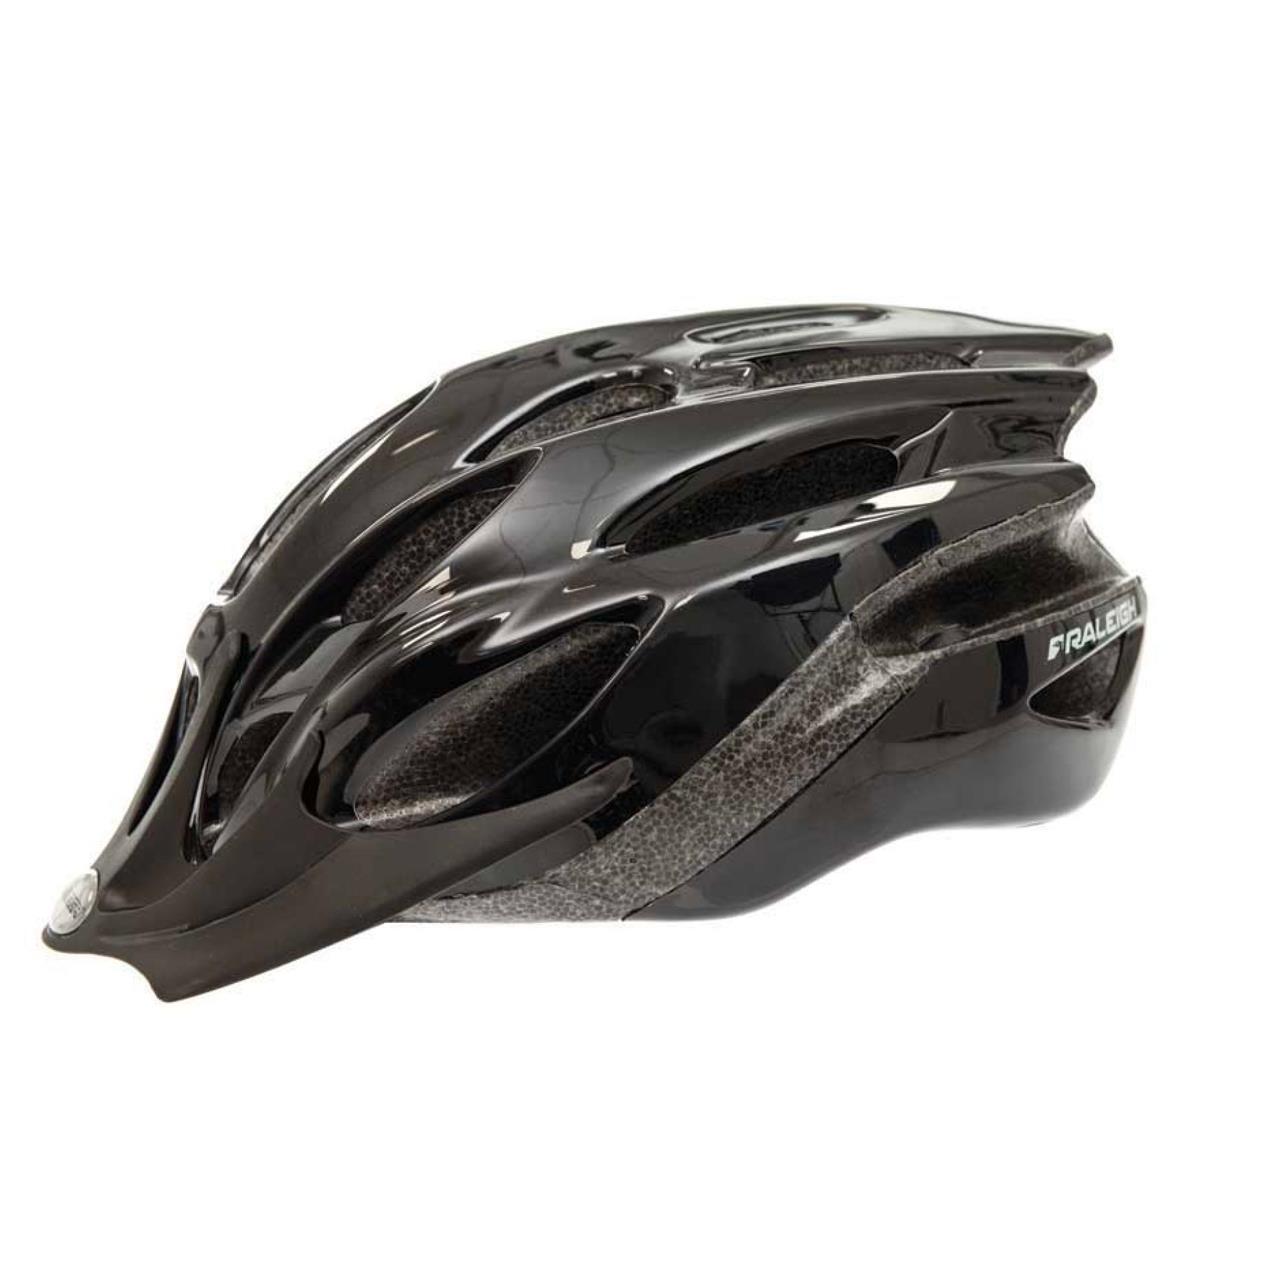 Raleigh Mission Evo Helmet (54-58cm, Black)